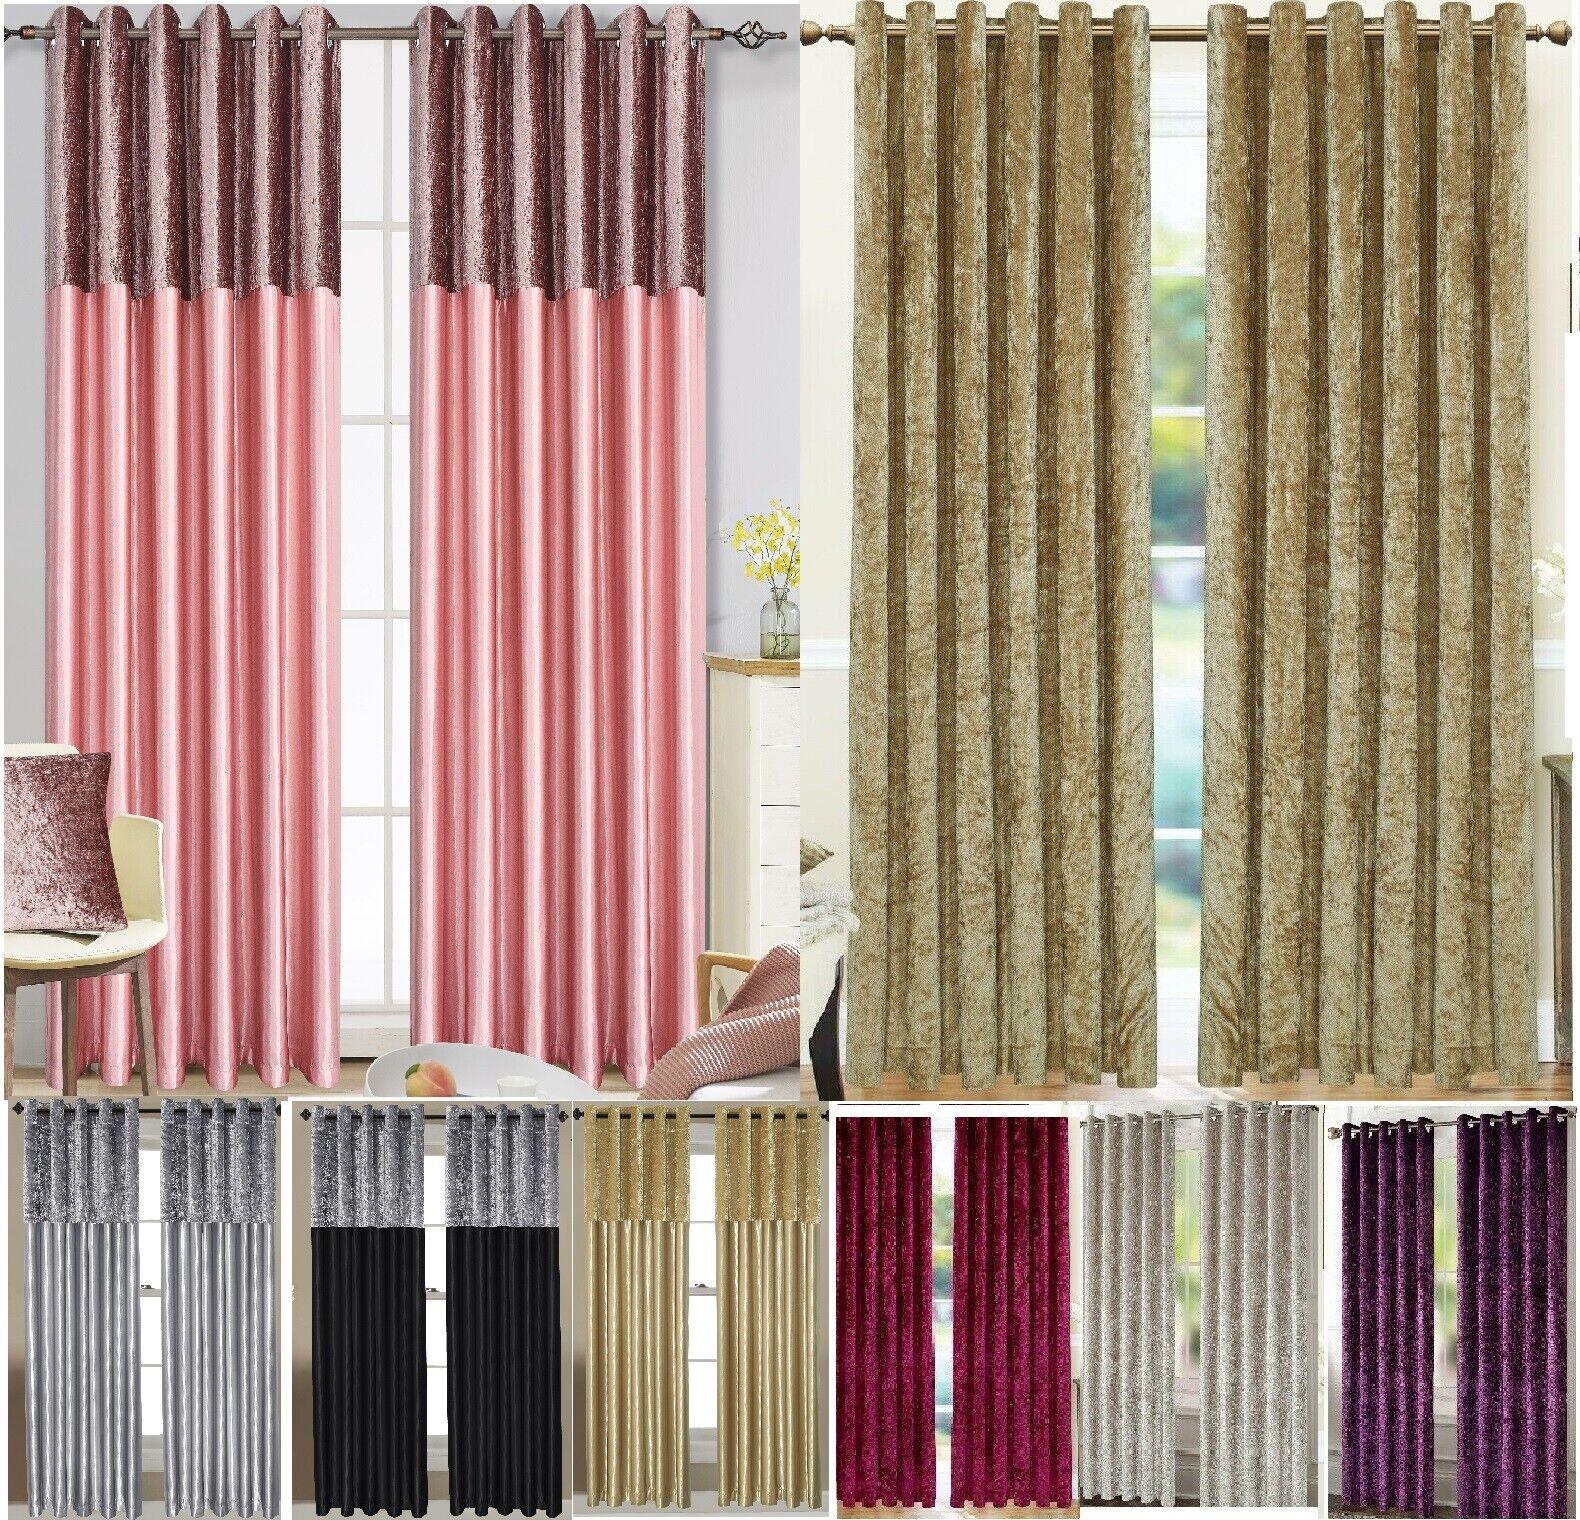 Harlow Thermal Blockout Eyelet Curtains